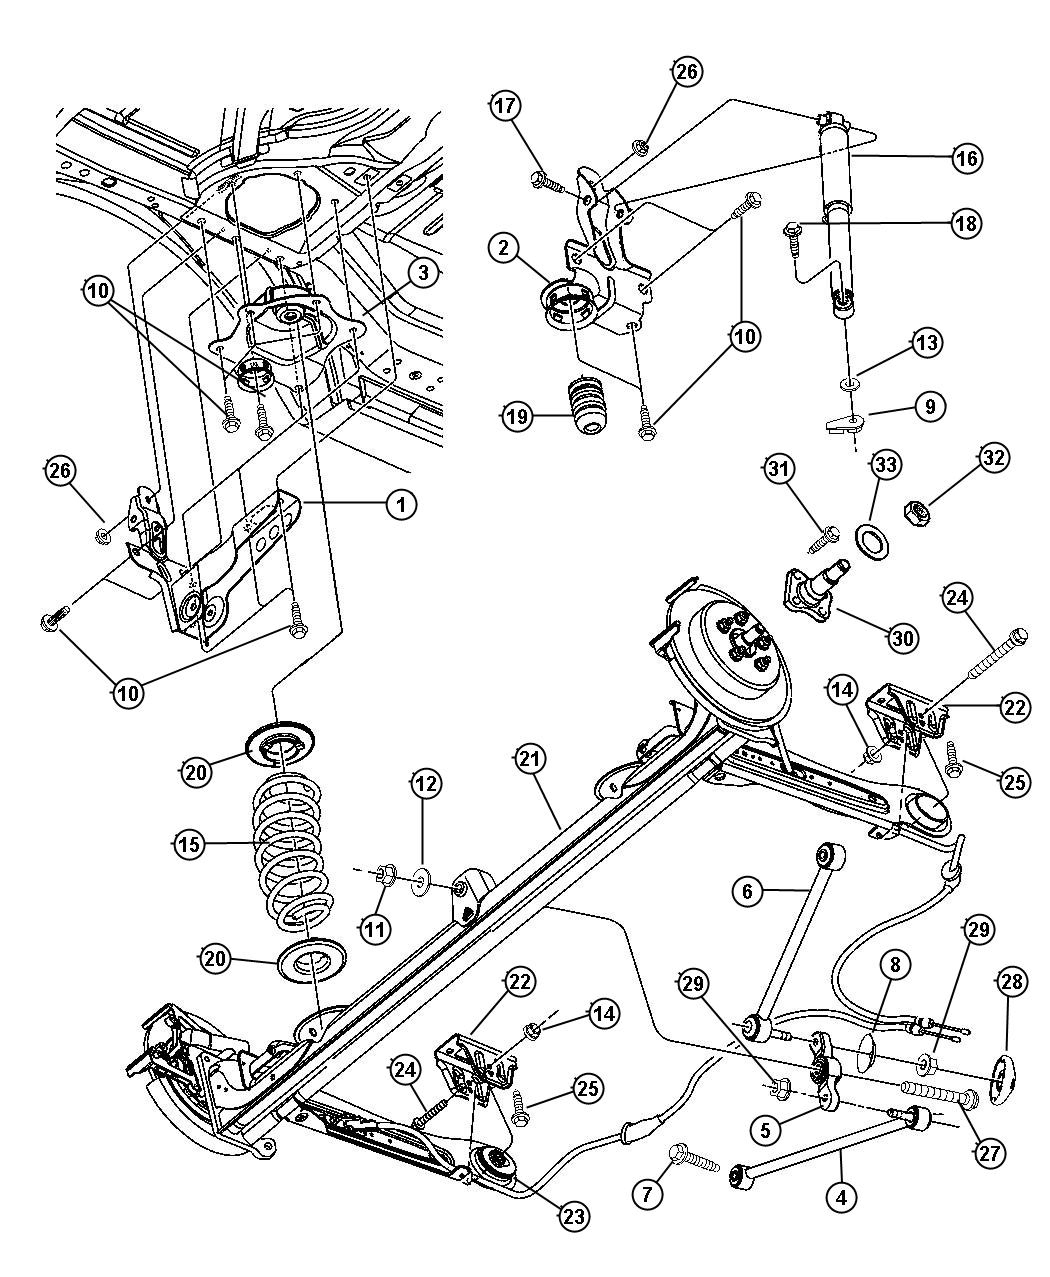 2001 pt cruiser wiring diagram 2004 jeep liberty radio 2002 parts imageresizertool com